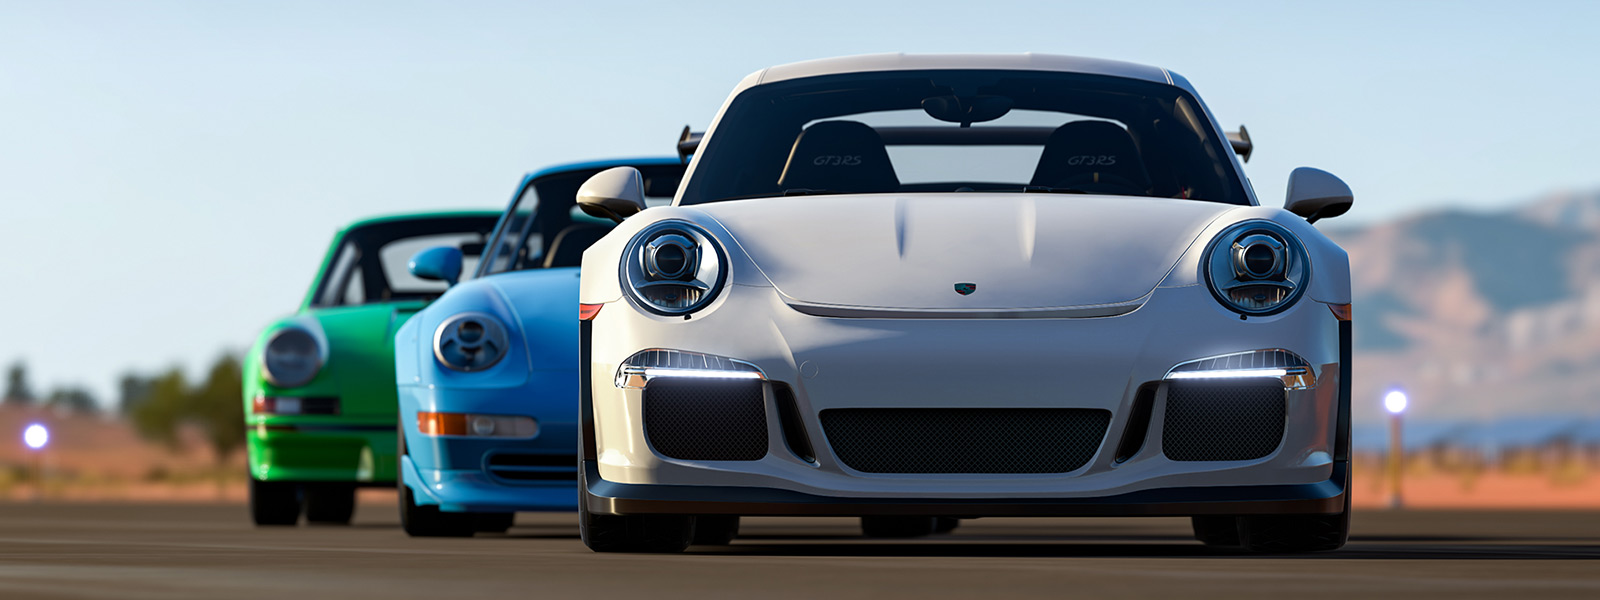 Porsche-autopakket